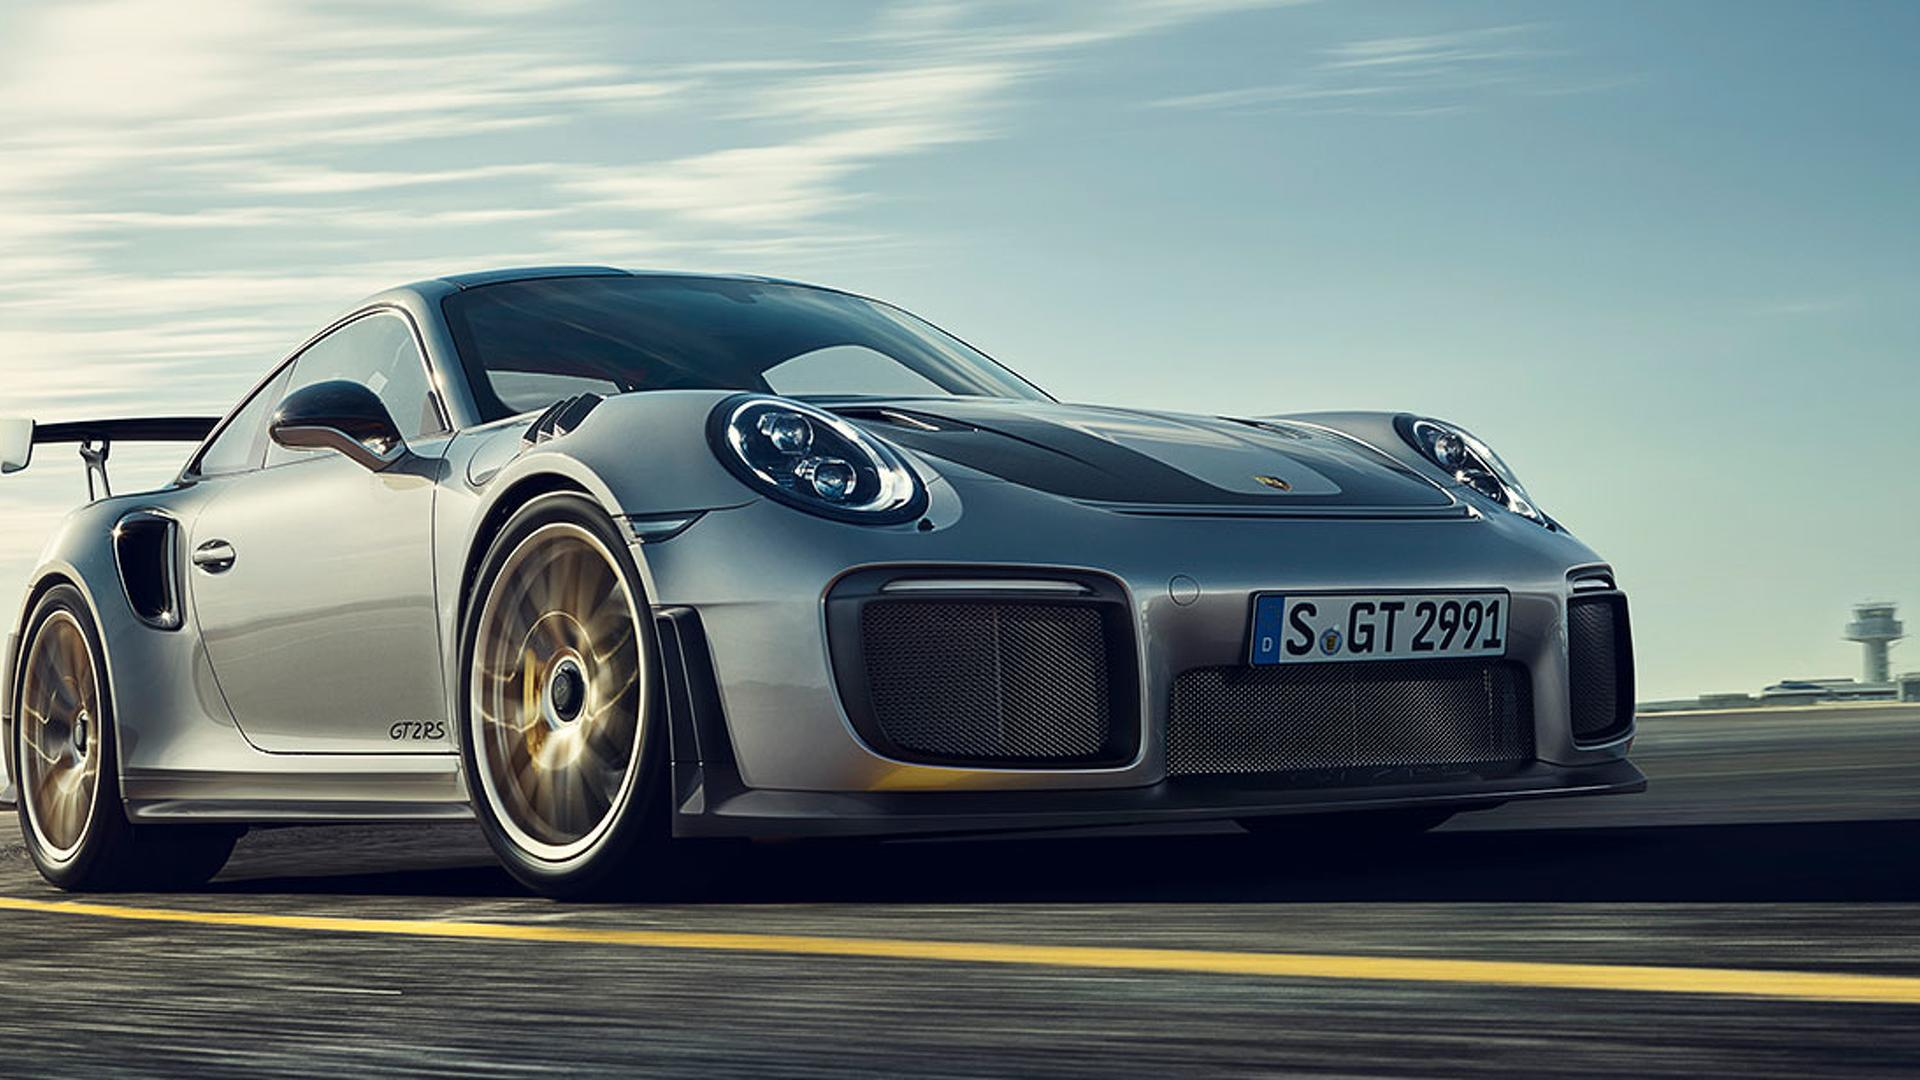 2018-porsche-911-gt2-rs Astounding Porsche 911 Gt2 for Sale Canada Cars Trend